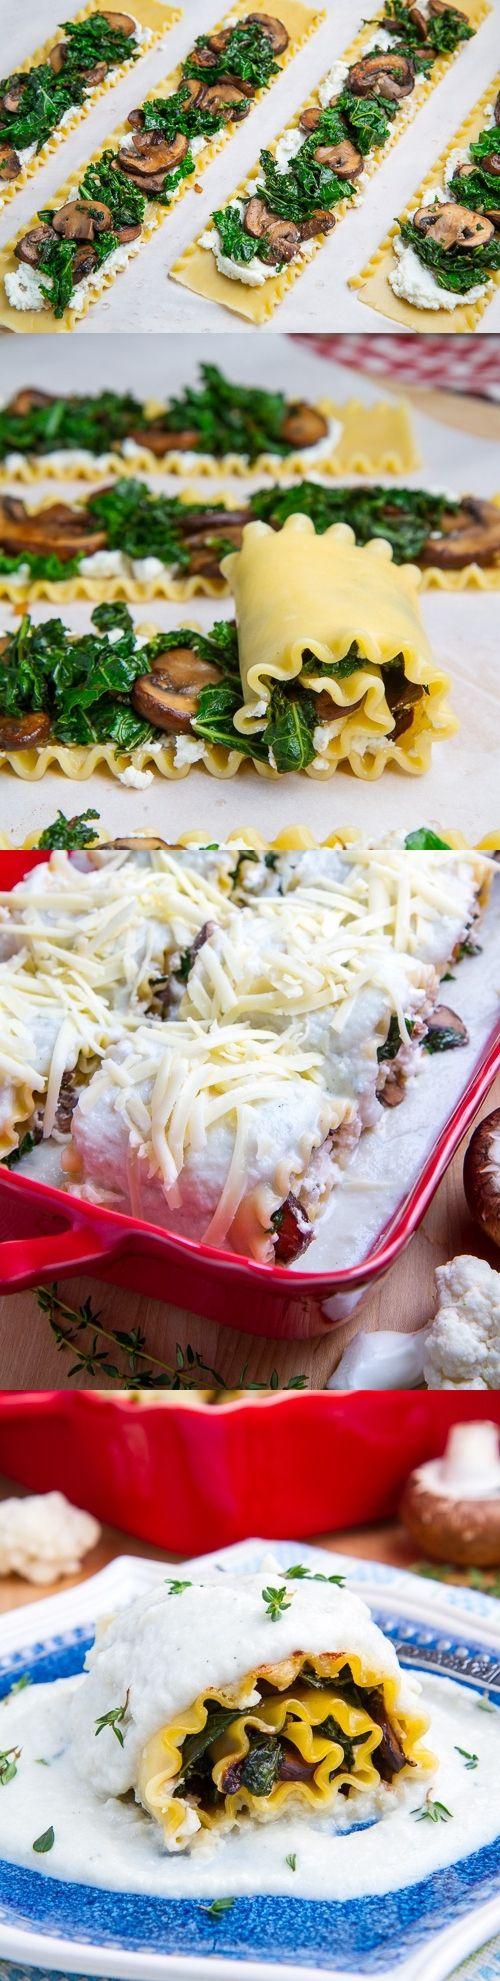 mushroom-and-kale-lasagna-rolls | pasta's | Pinterest